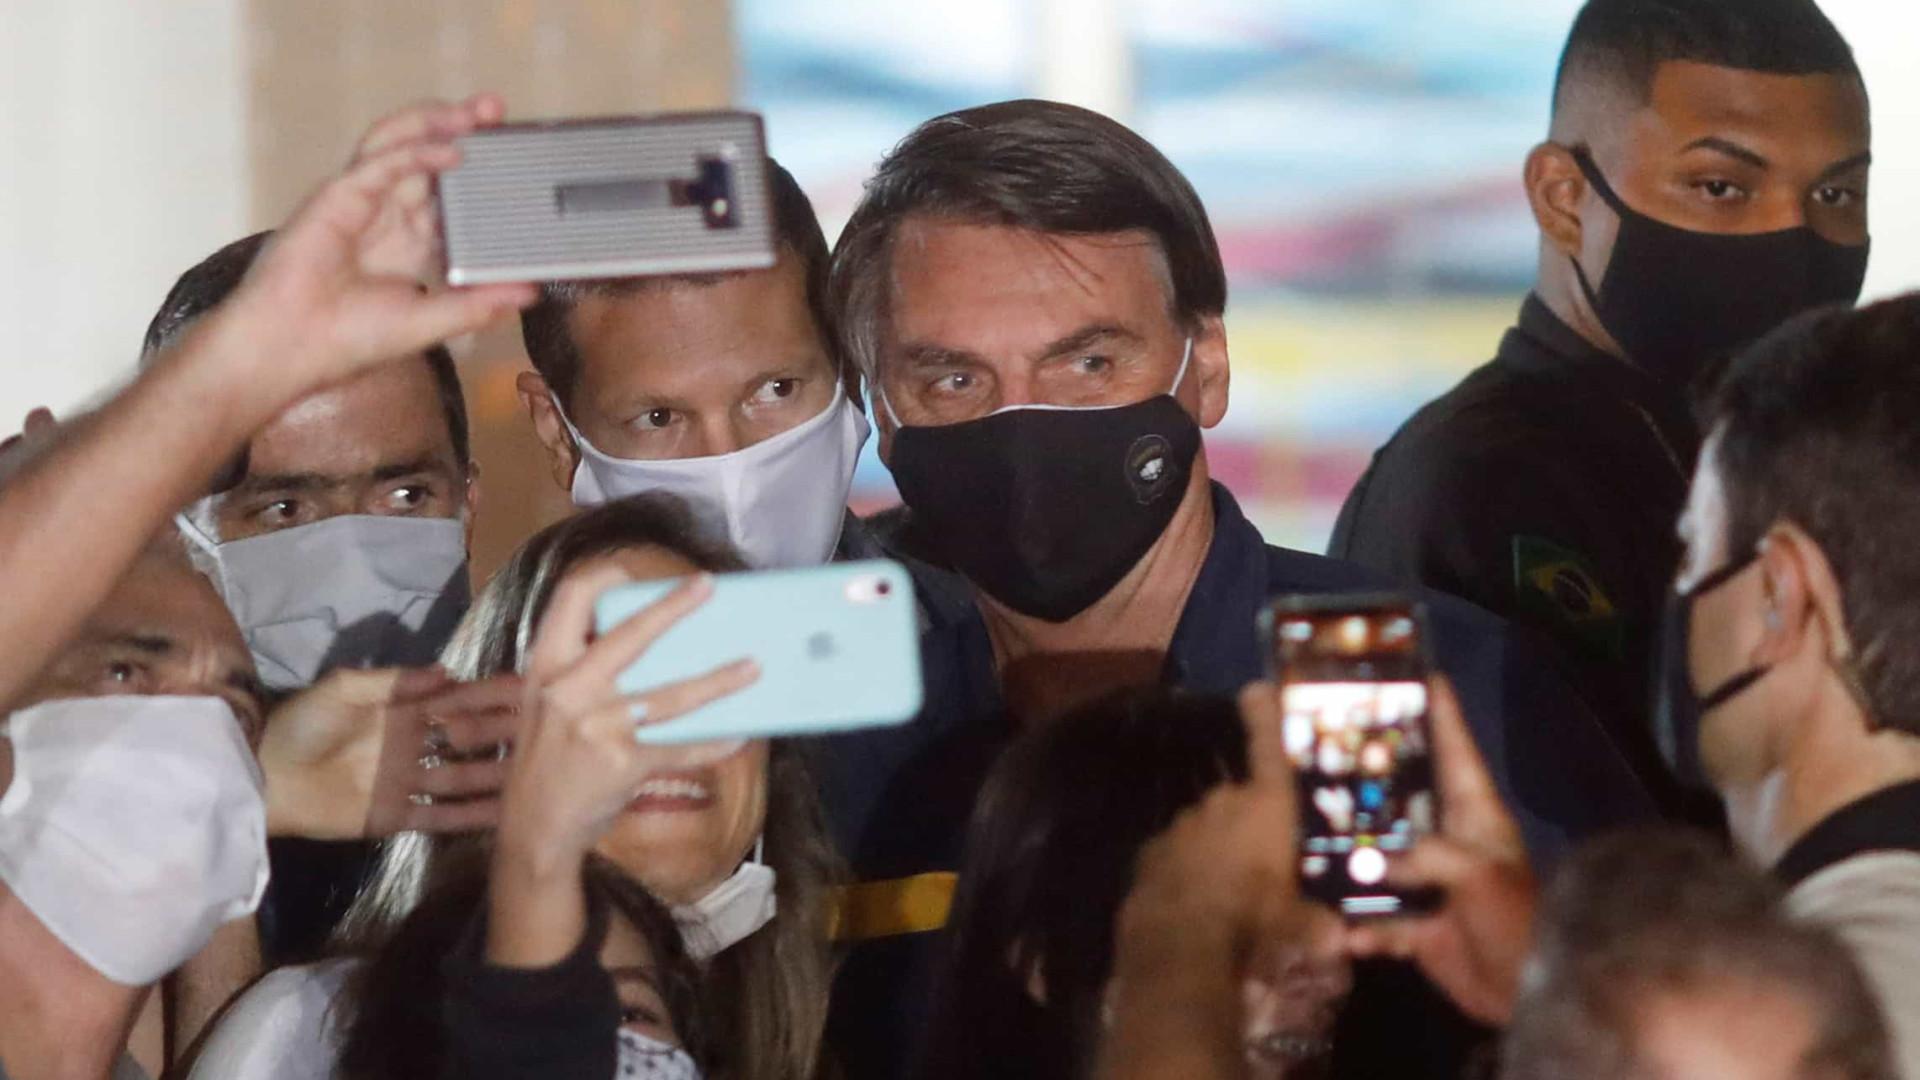 Procuradores veem indícios de crime de Bolsonaro